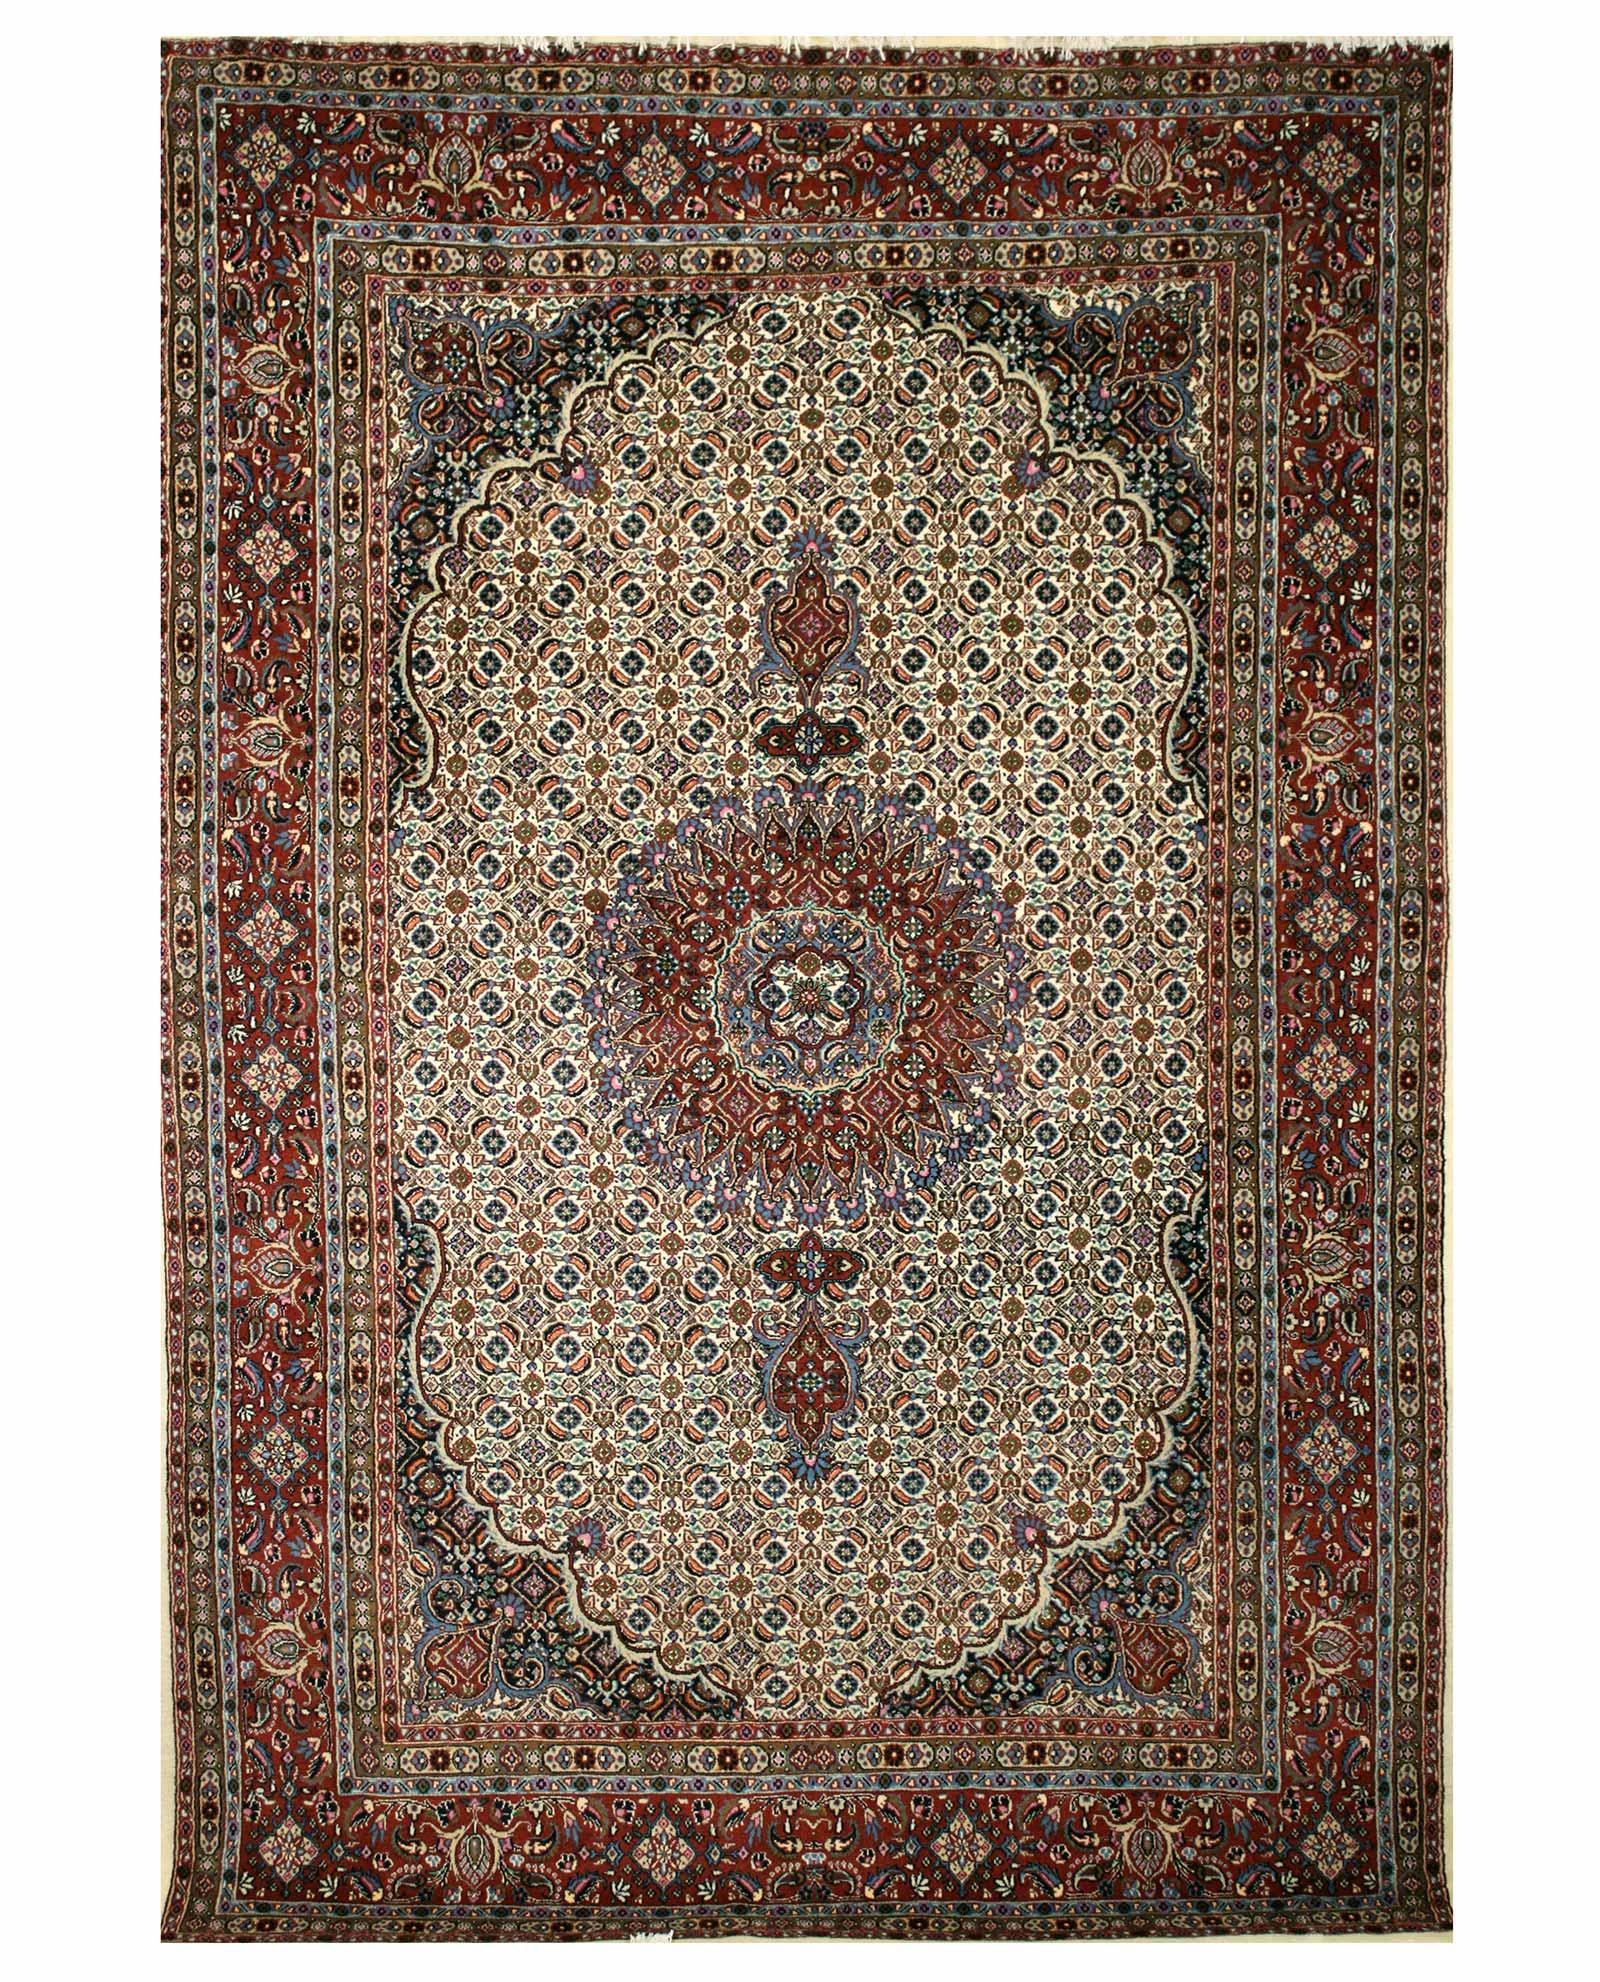 Tapis Persan Moud 14973 Iranian Carpet